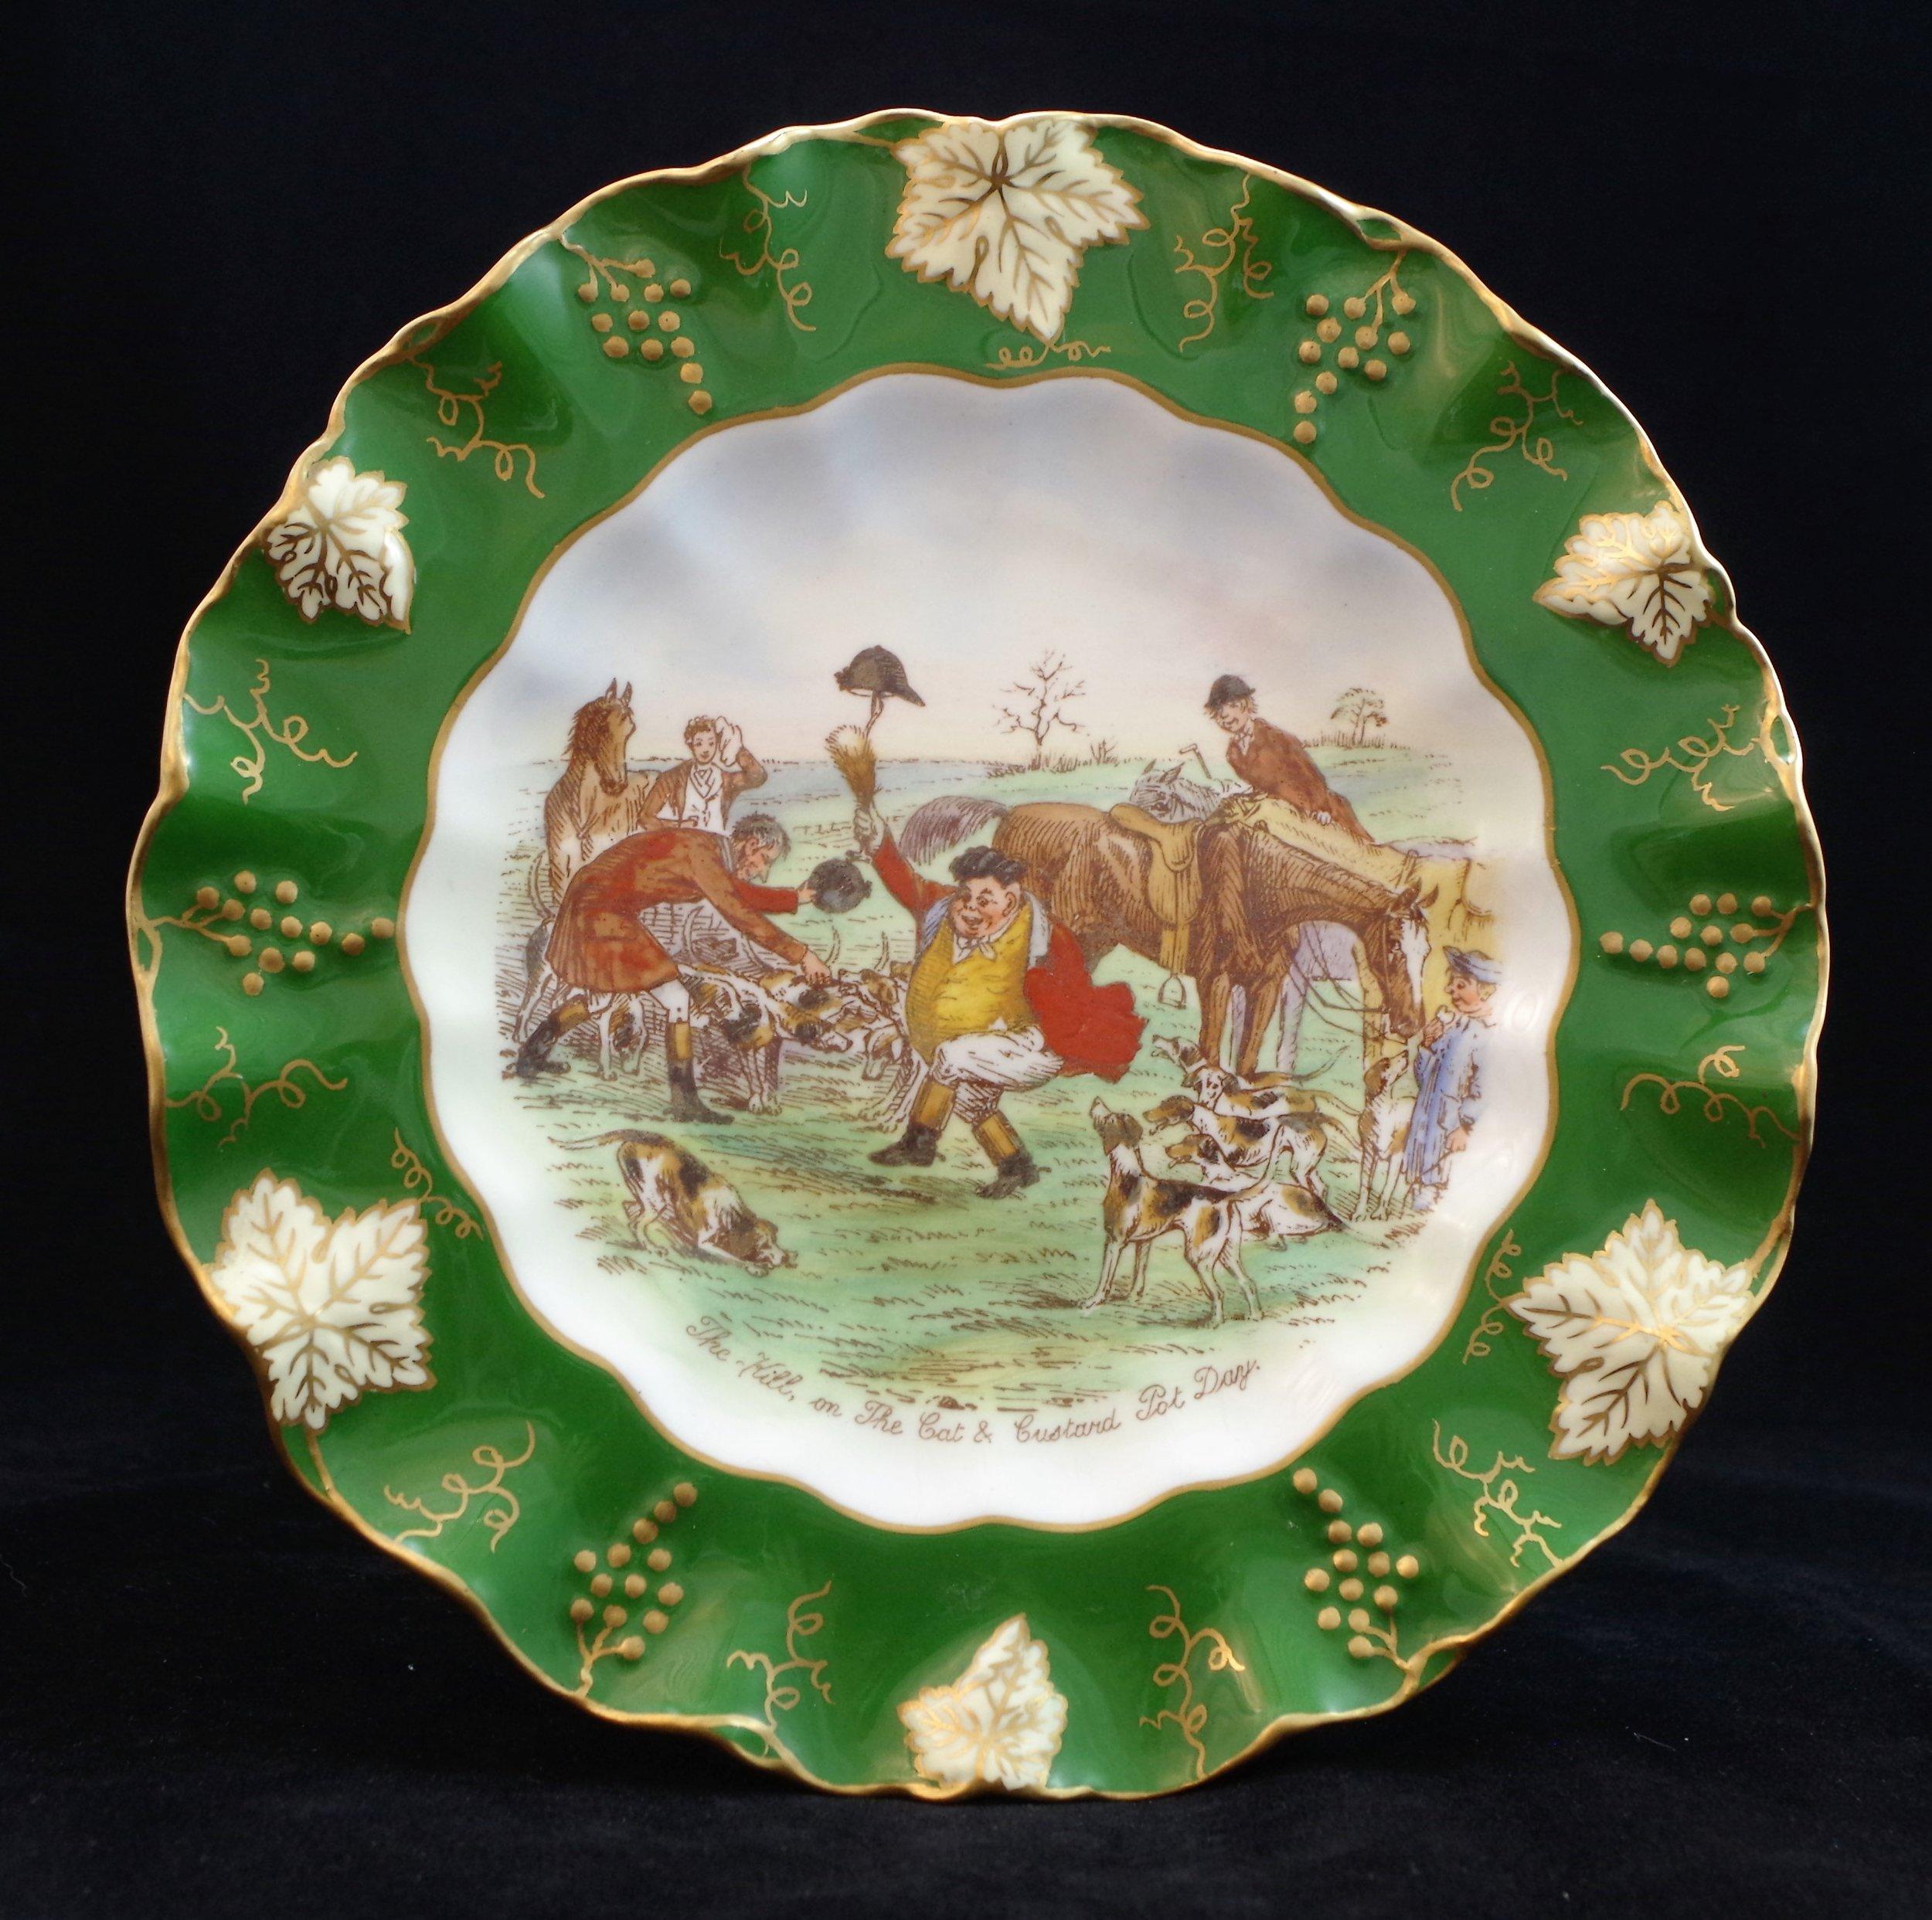 royal-crown-derby-vine-siam-green-ground-jorrocks-5